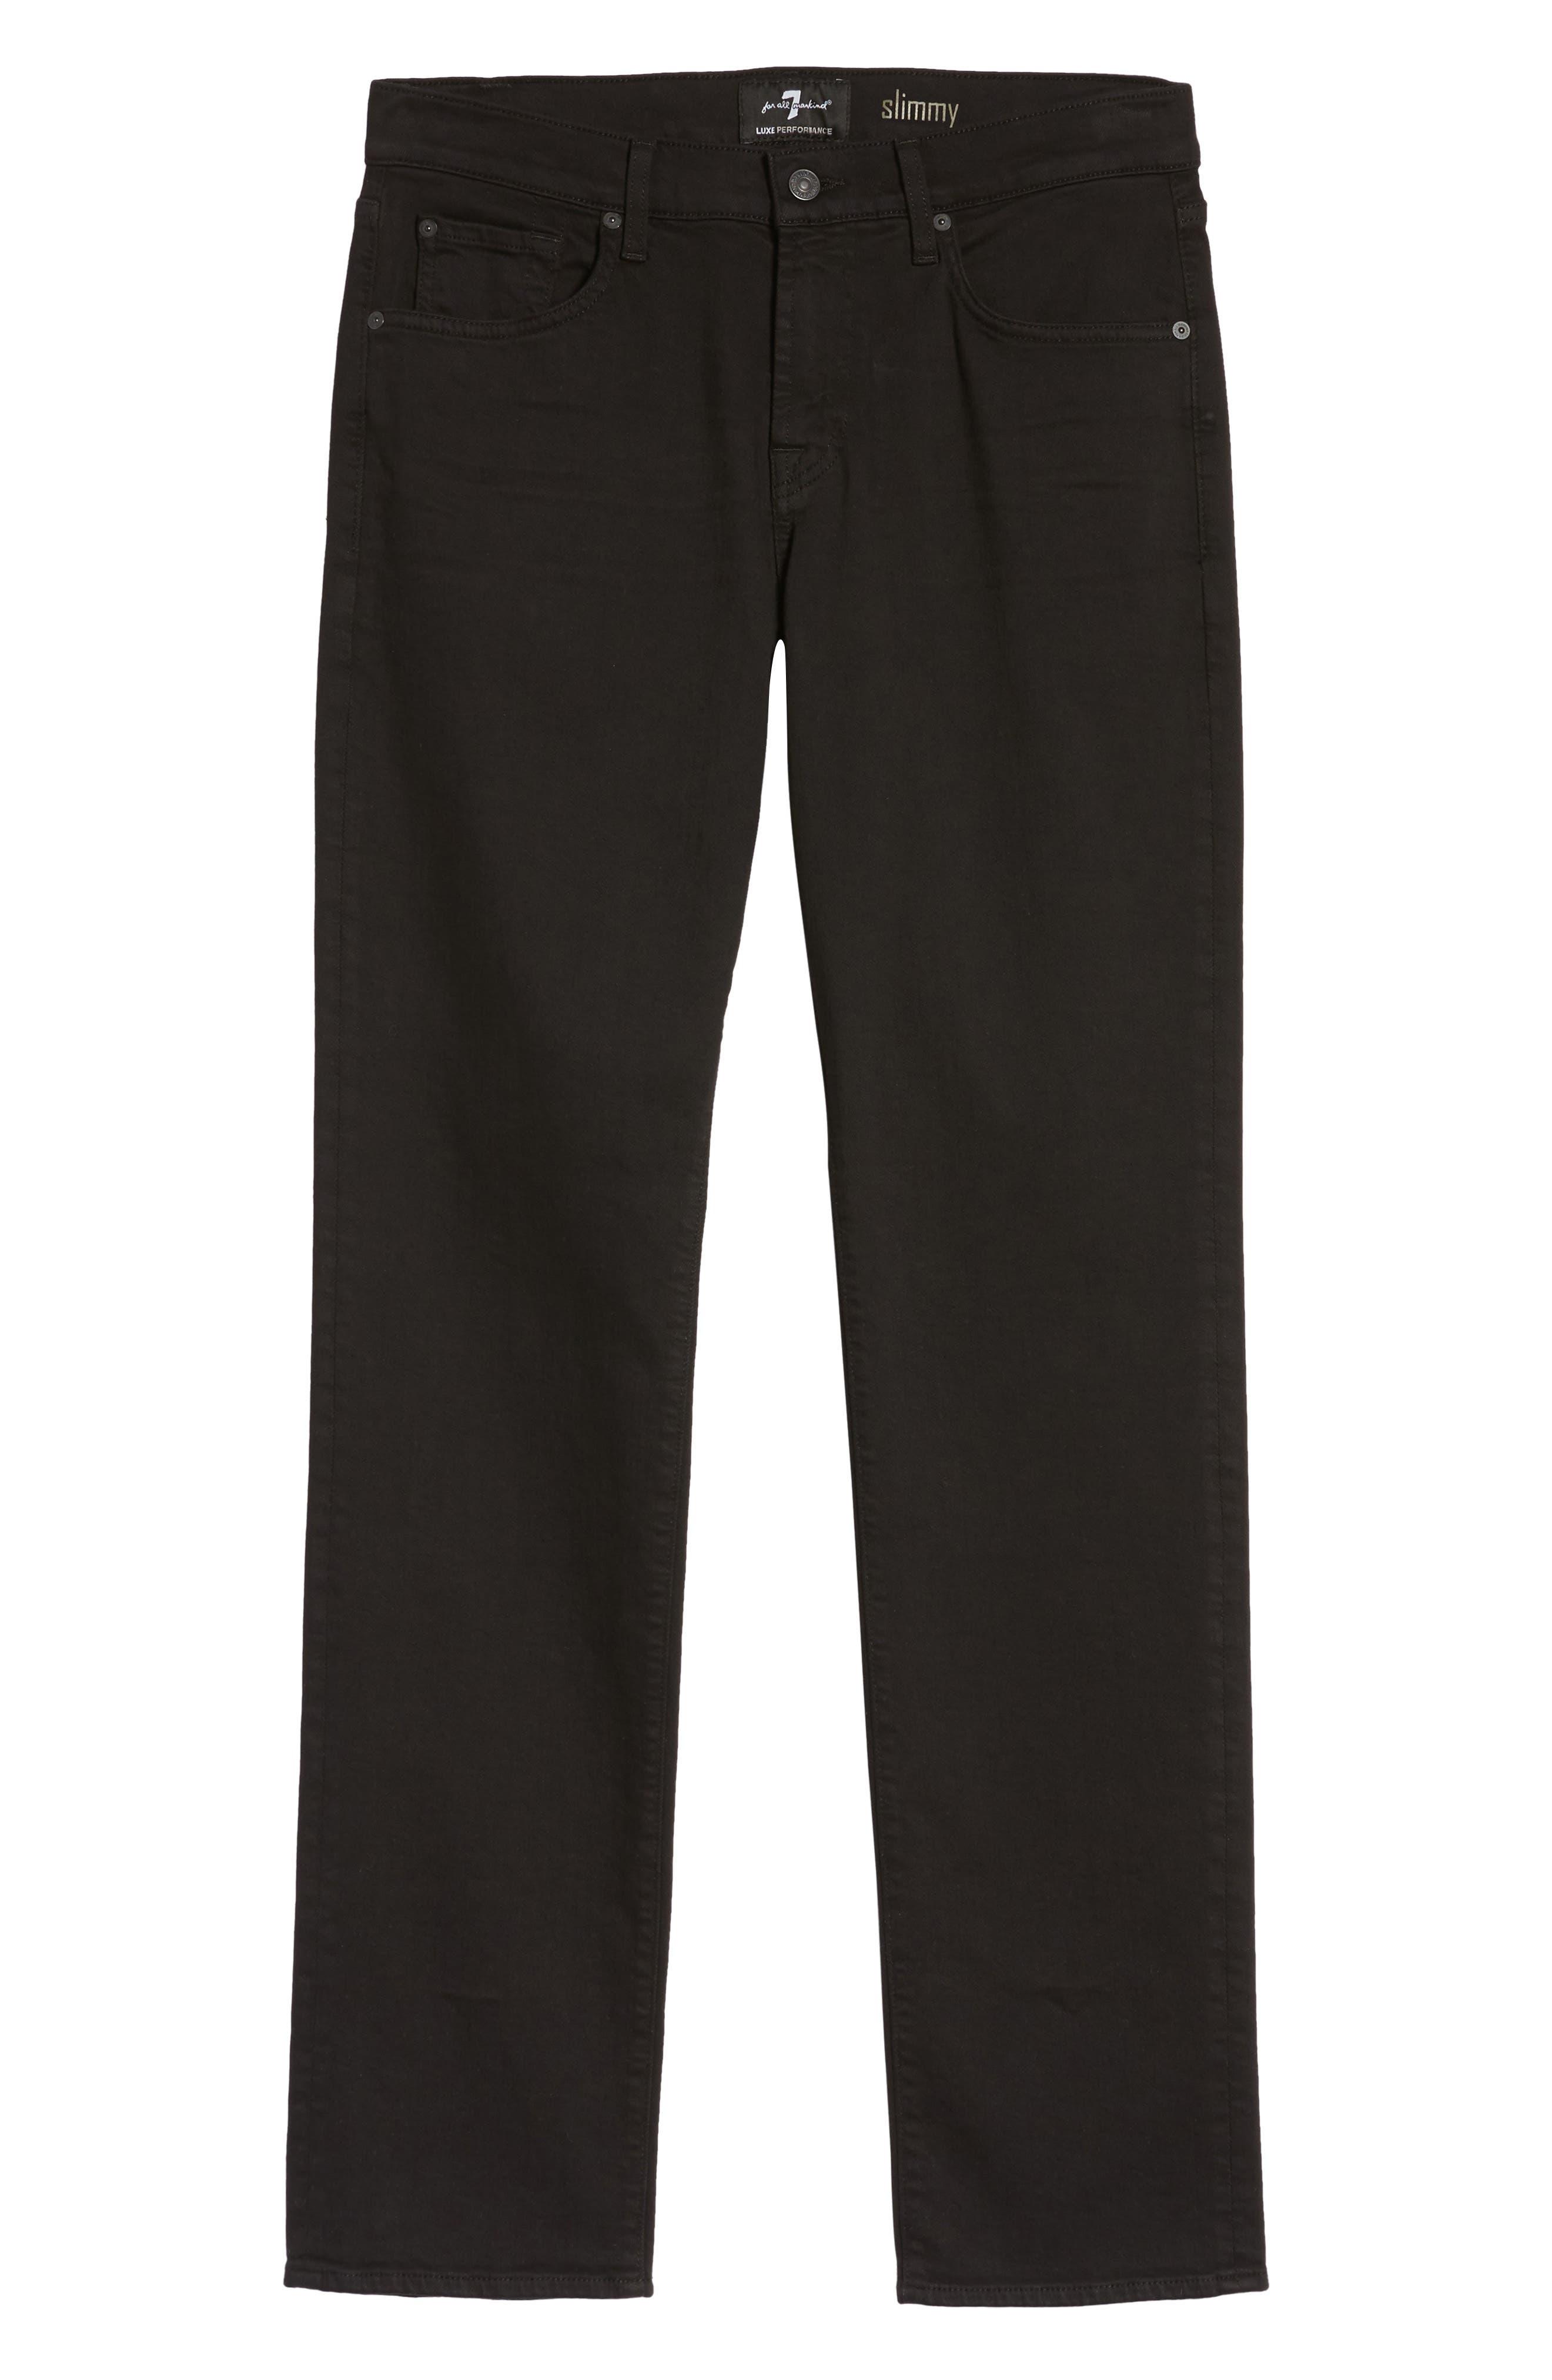 Luxe Performance - Slimmy Slim Fit Jeans,                             Alternate thumbnail 6, color,                             ANNEX BLACK